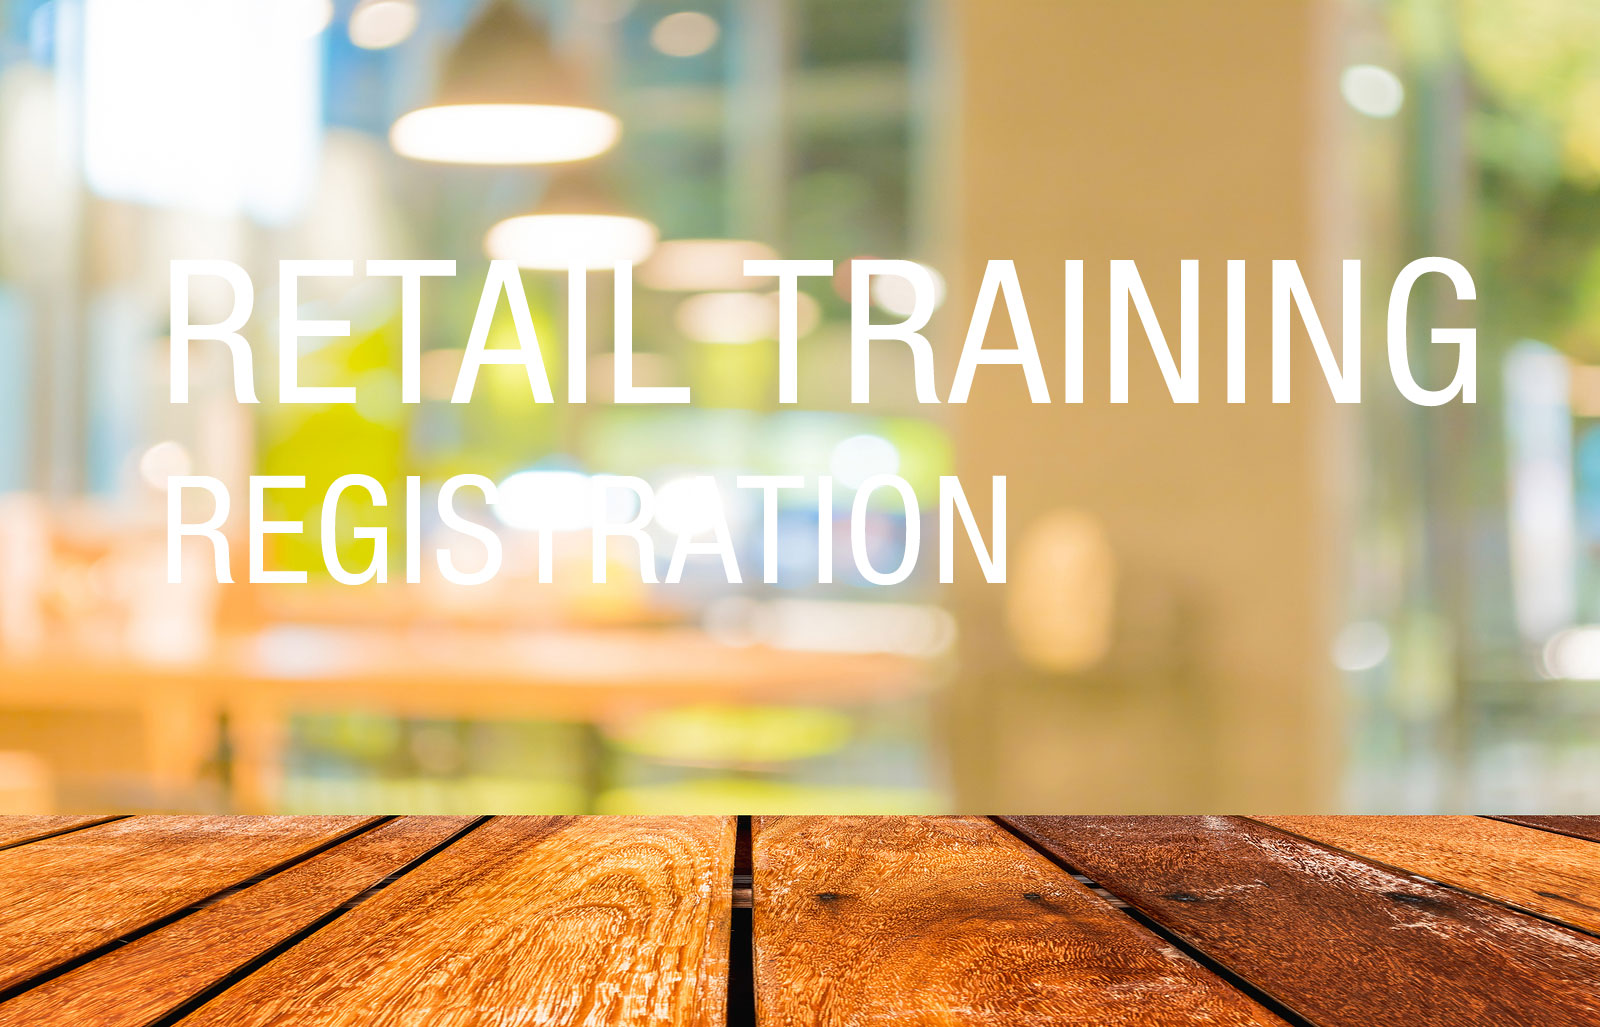 Registration for RETAIL TRAINING